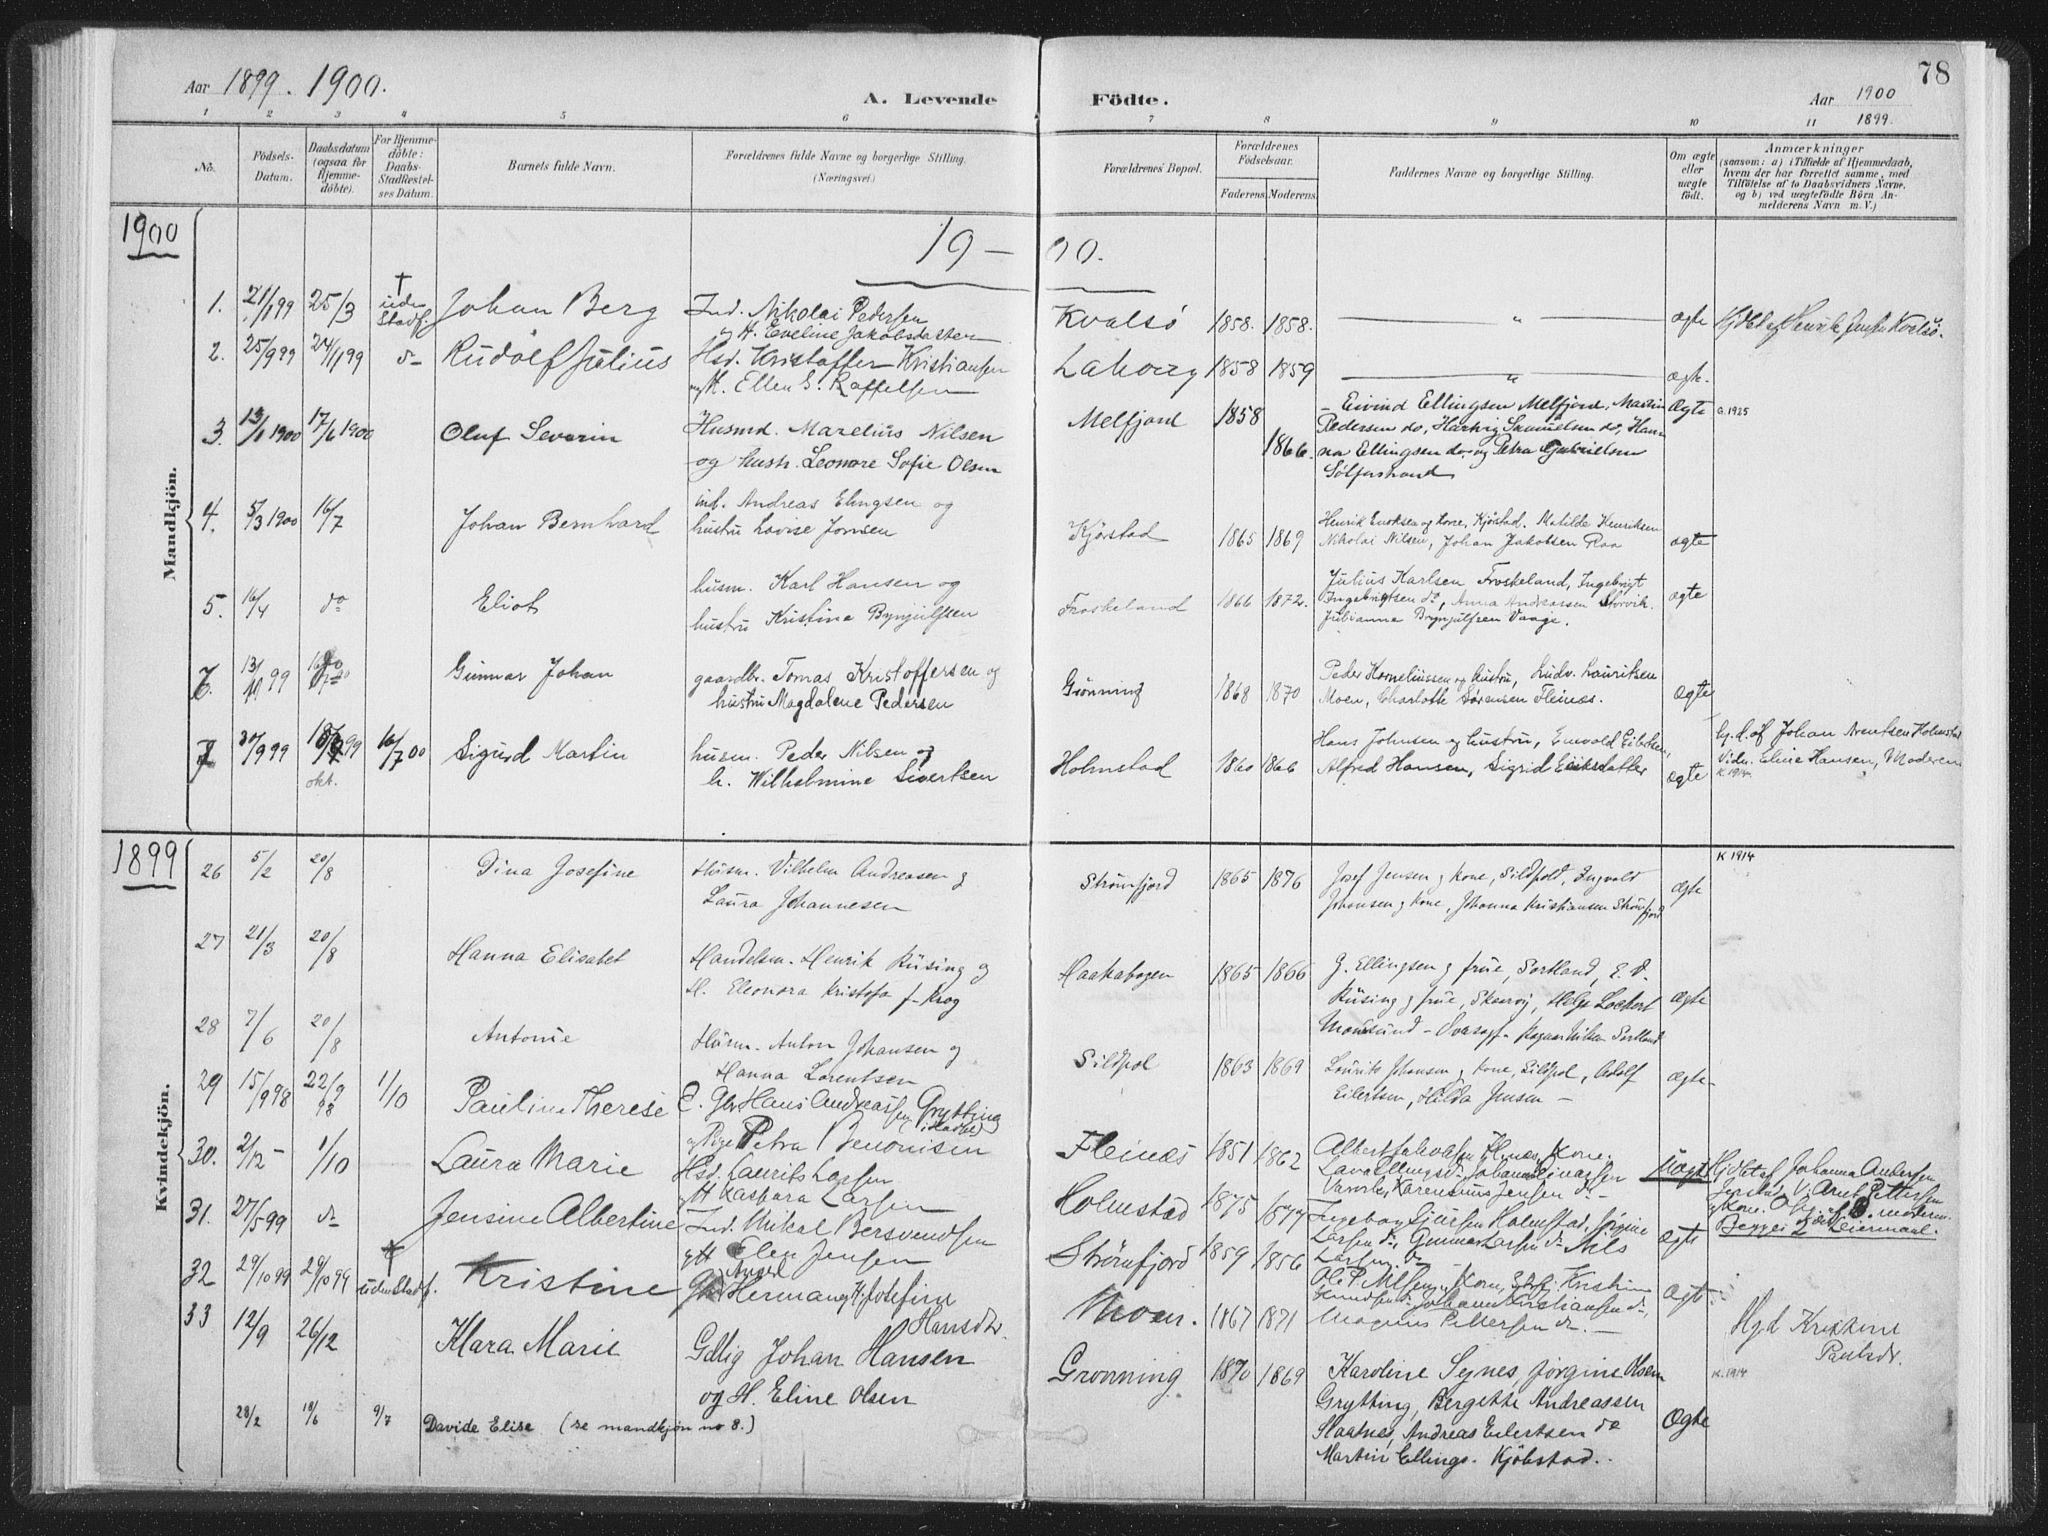 SAT, Ministerialprotokoller, klokkerbøker og fødselsregistre - Nordland, 890/L1286: Ministerialbok nr. 890A01, 1882-1902, s. 78